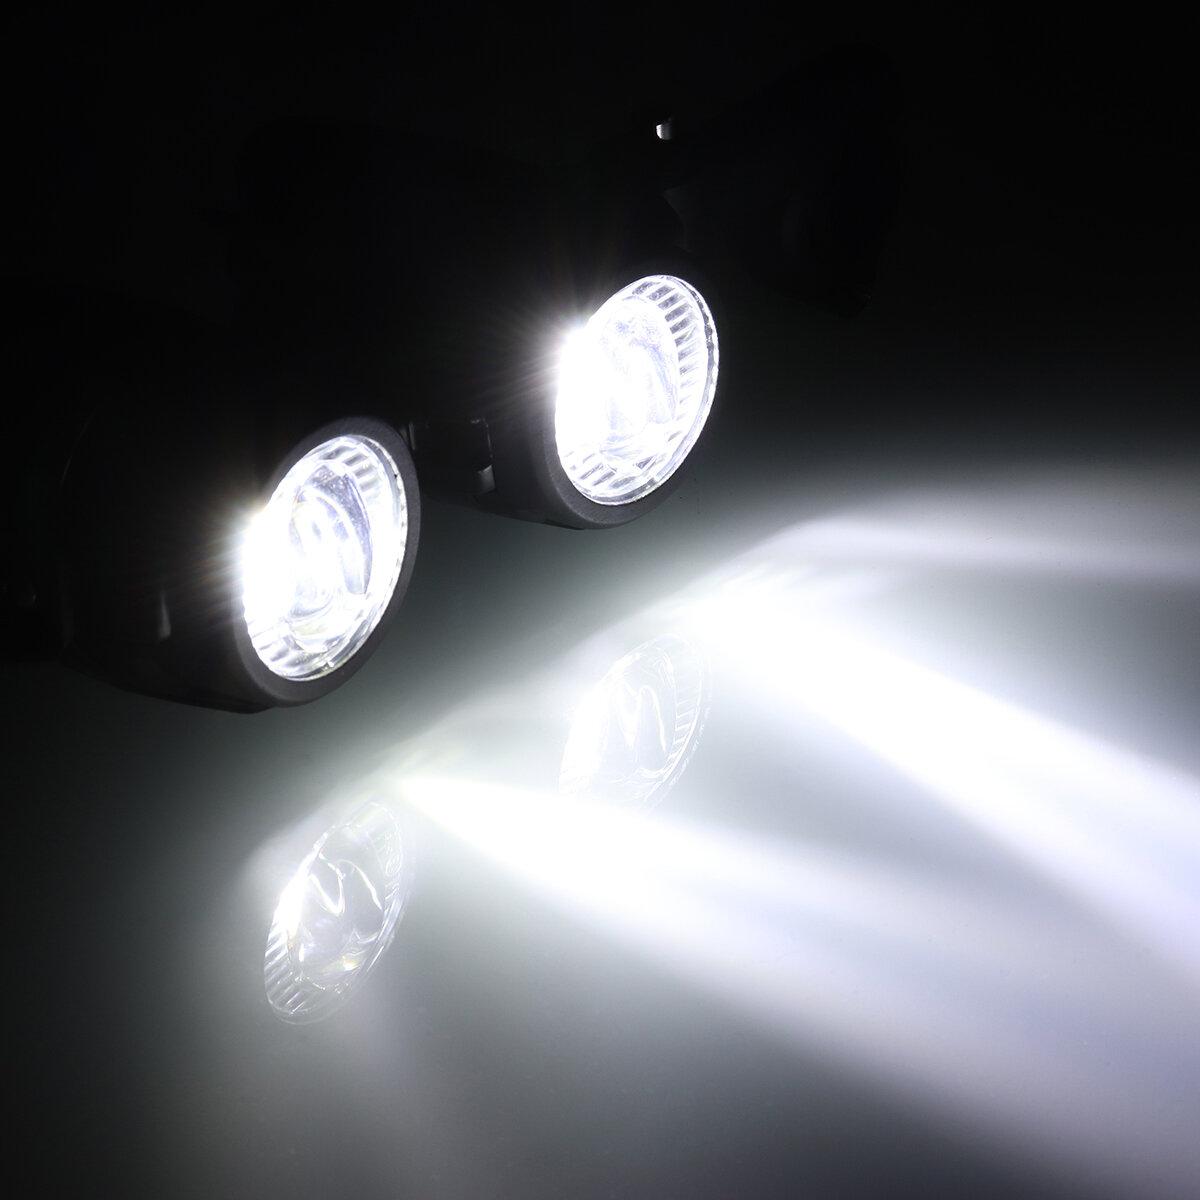 Universal Motorcycle Angel Eye LED Headlight Running Light Hi / Lo Beam - 5